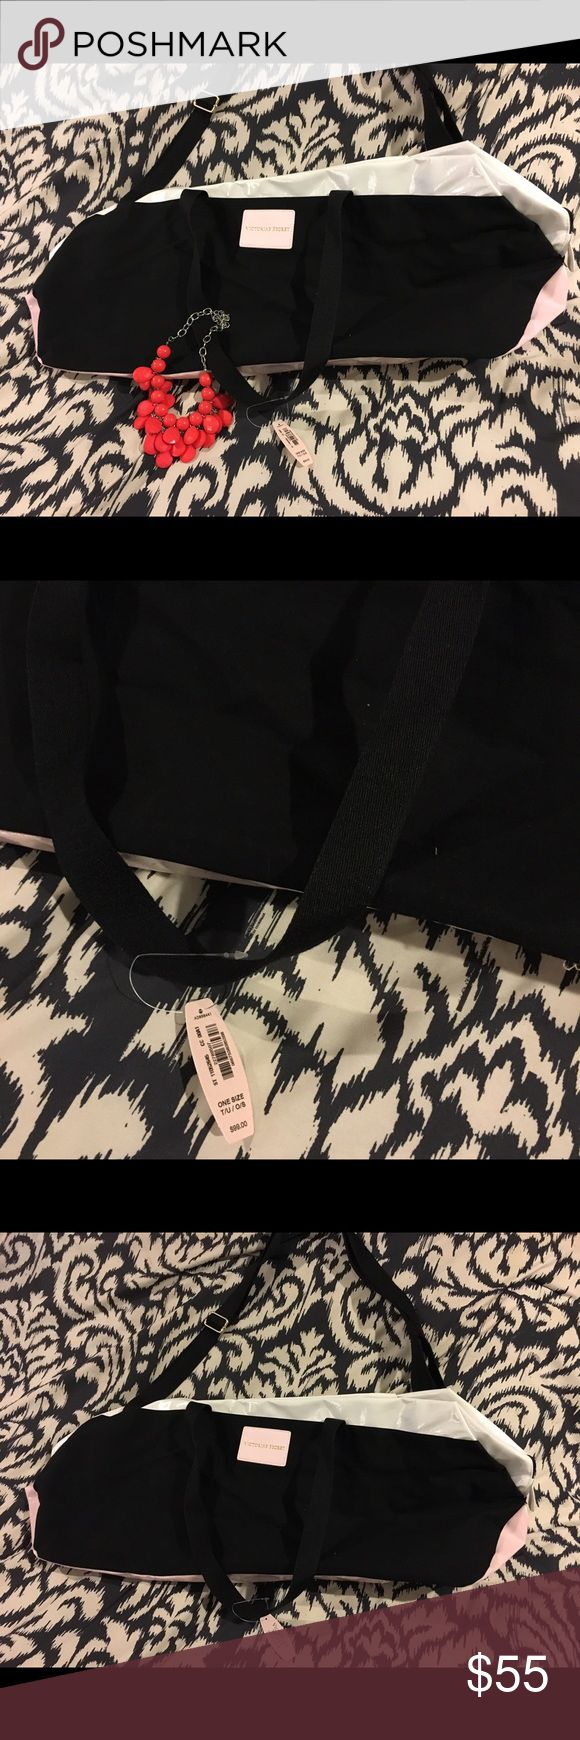 Large Victoria's Secret tote bag Large Victoria's Secret tote bag NWT Victoria's Secret Bags Totes